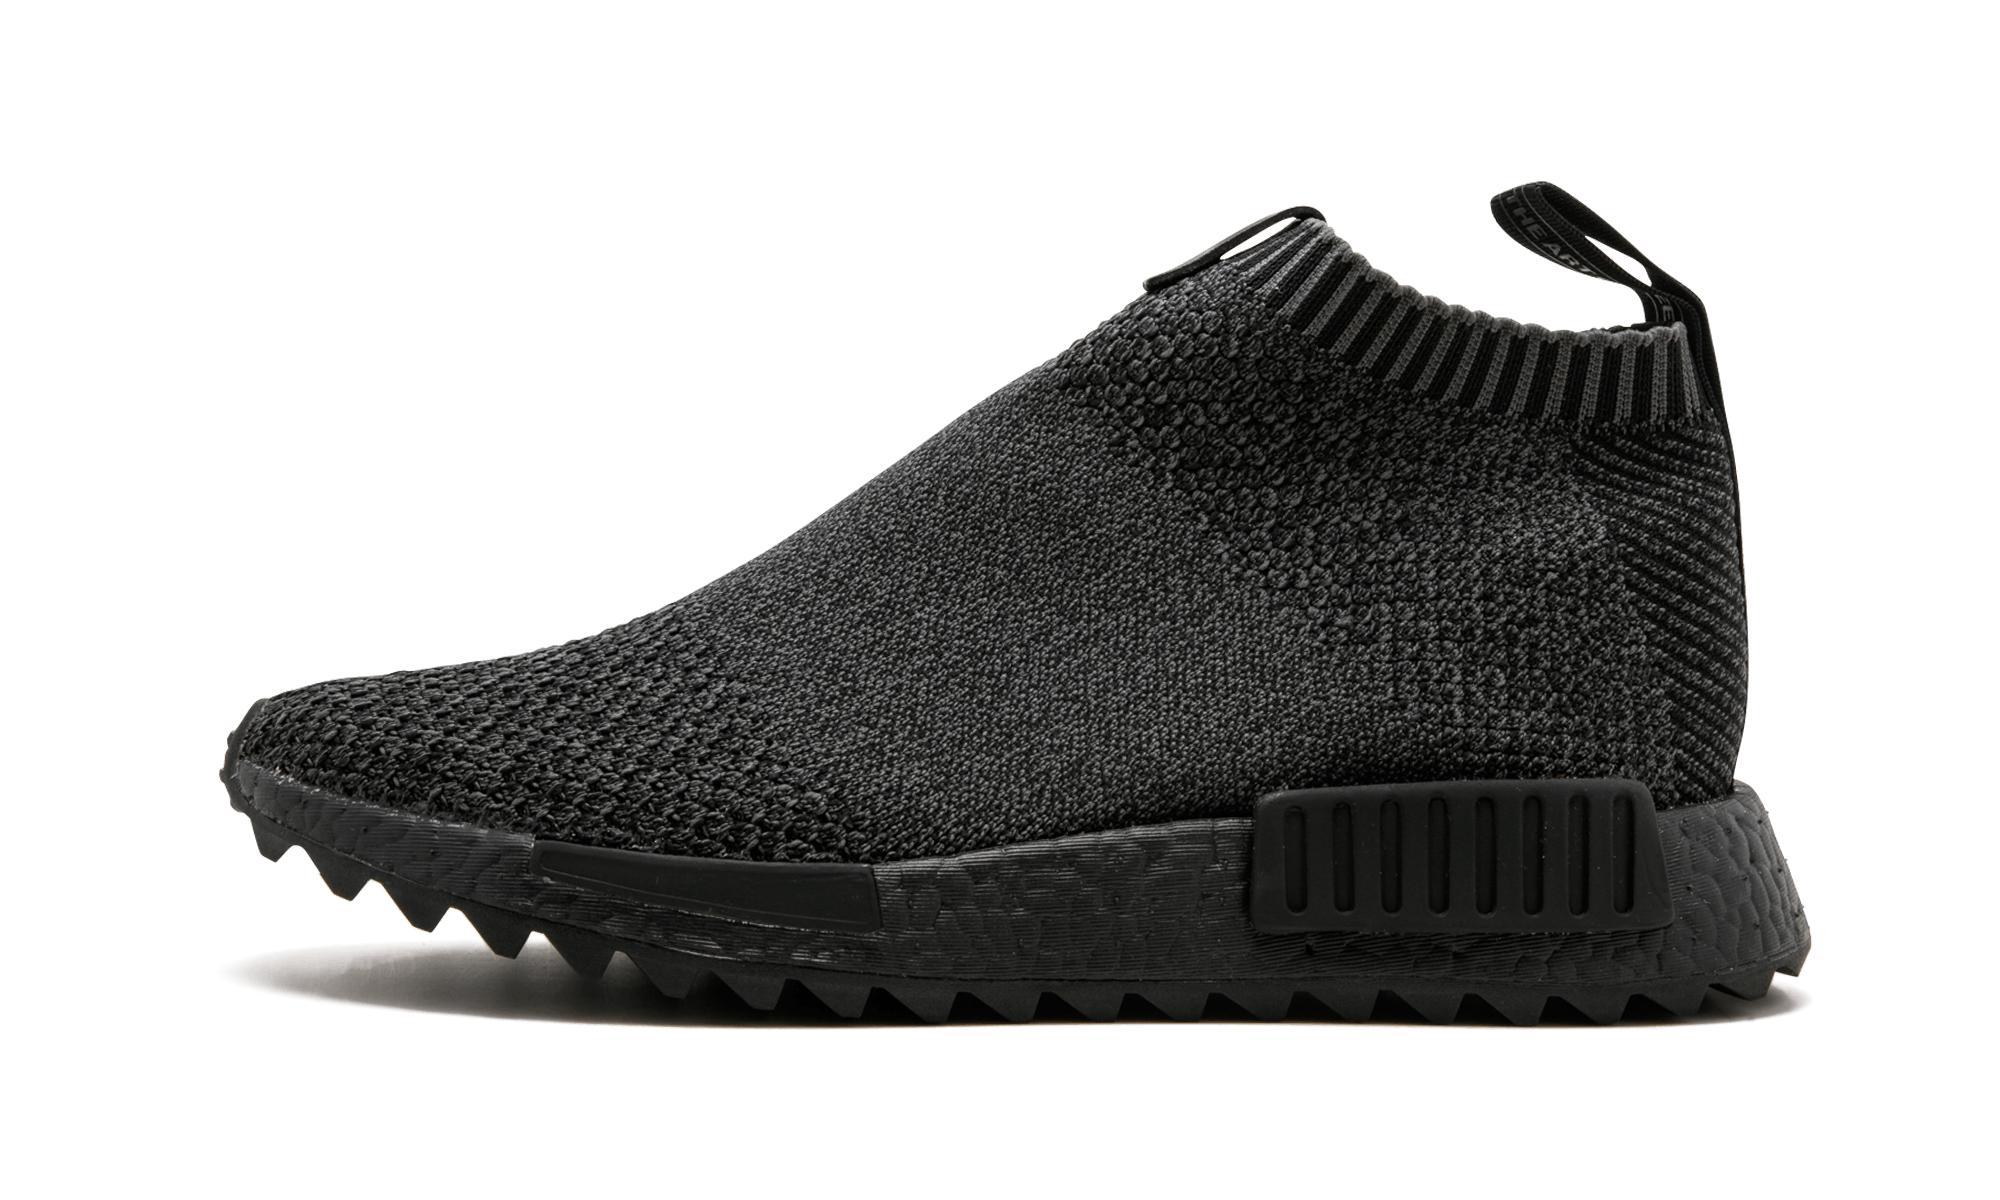 fcd74c5d06f adidas Nmd cs1 Pk Tgwo in Black for Men - Save 59% - Lyst